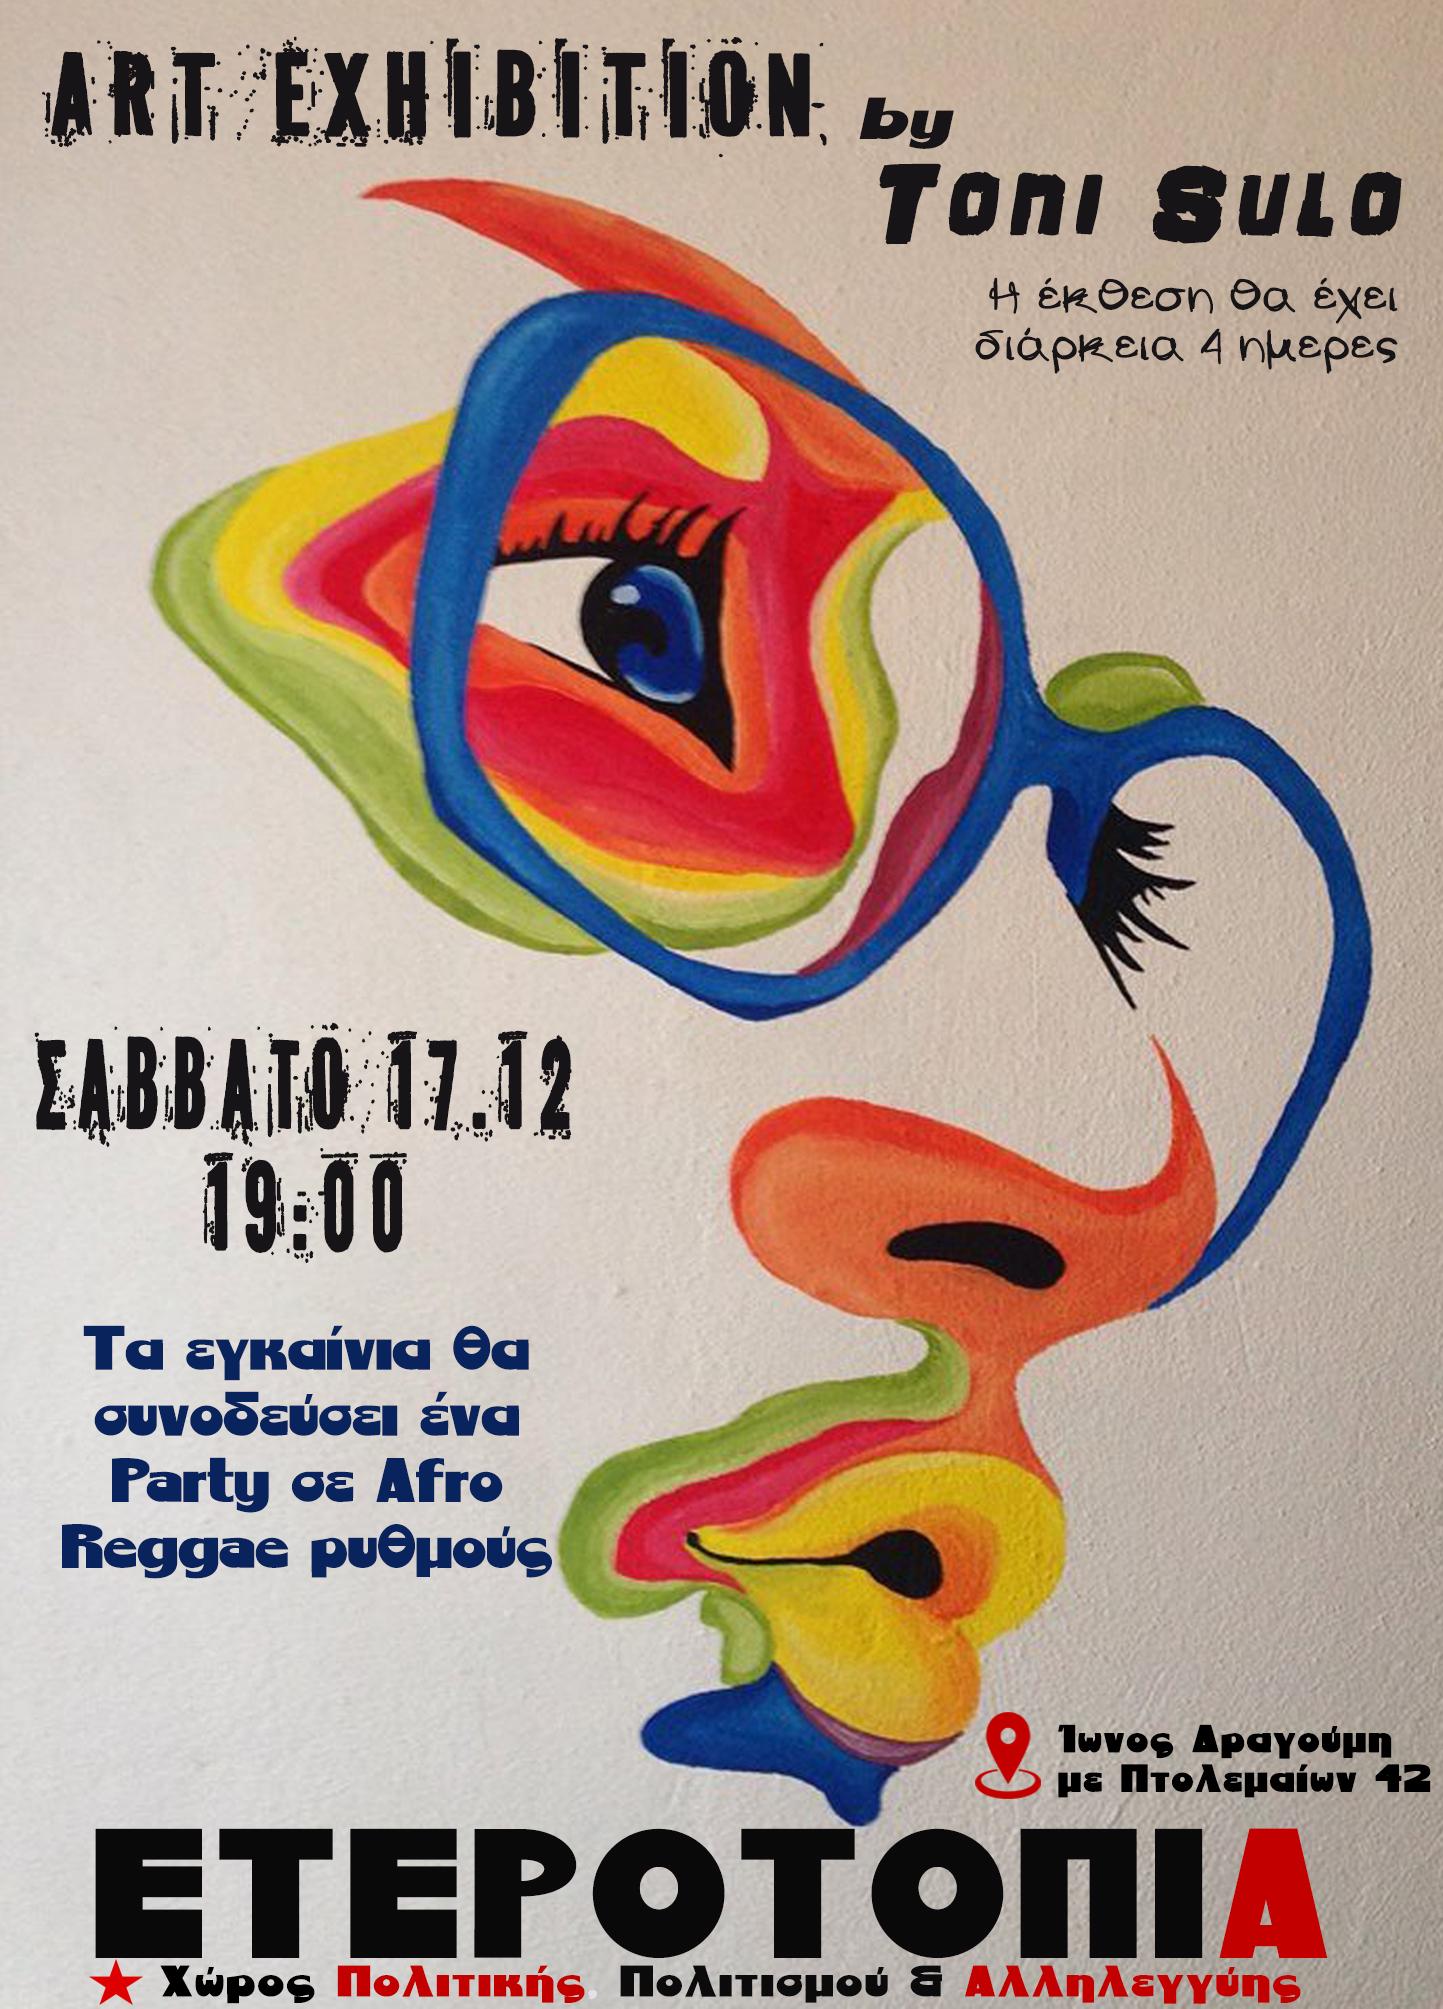 Art Exhibition by Toni Sulo | 17-21/12 στην ΕΤΕΡΟΤΟΠΙΑ